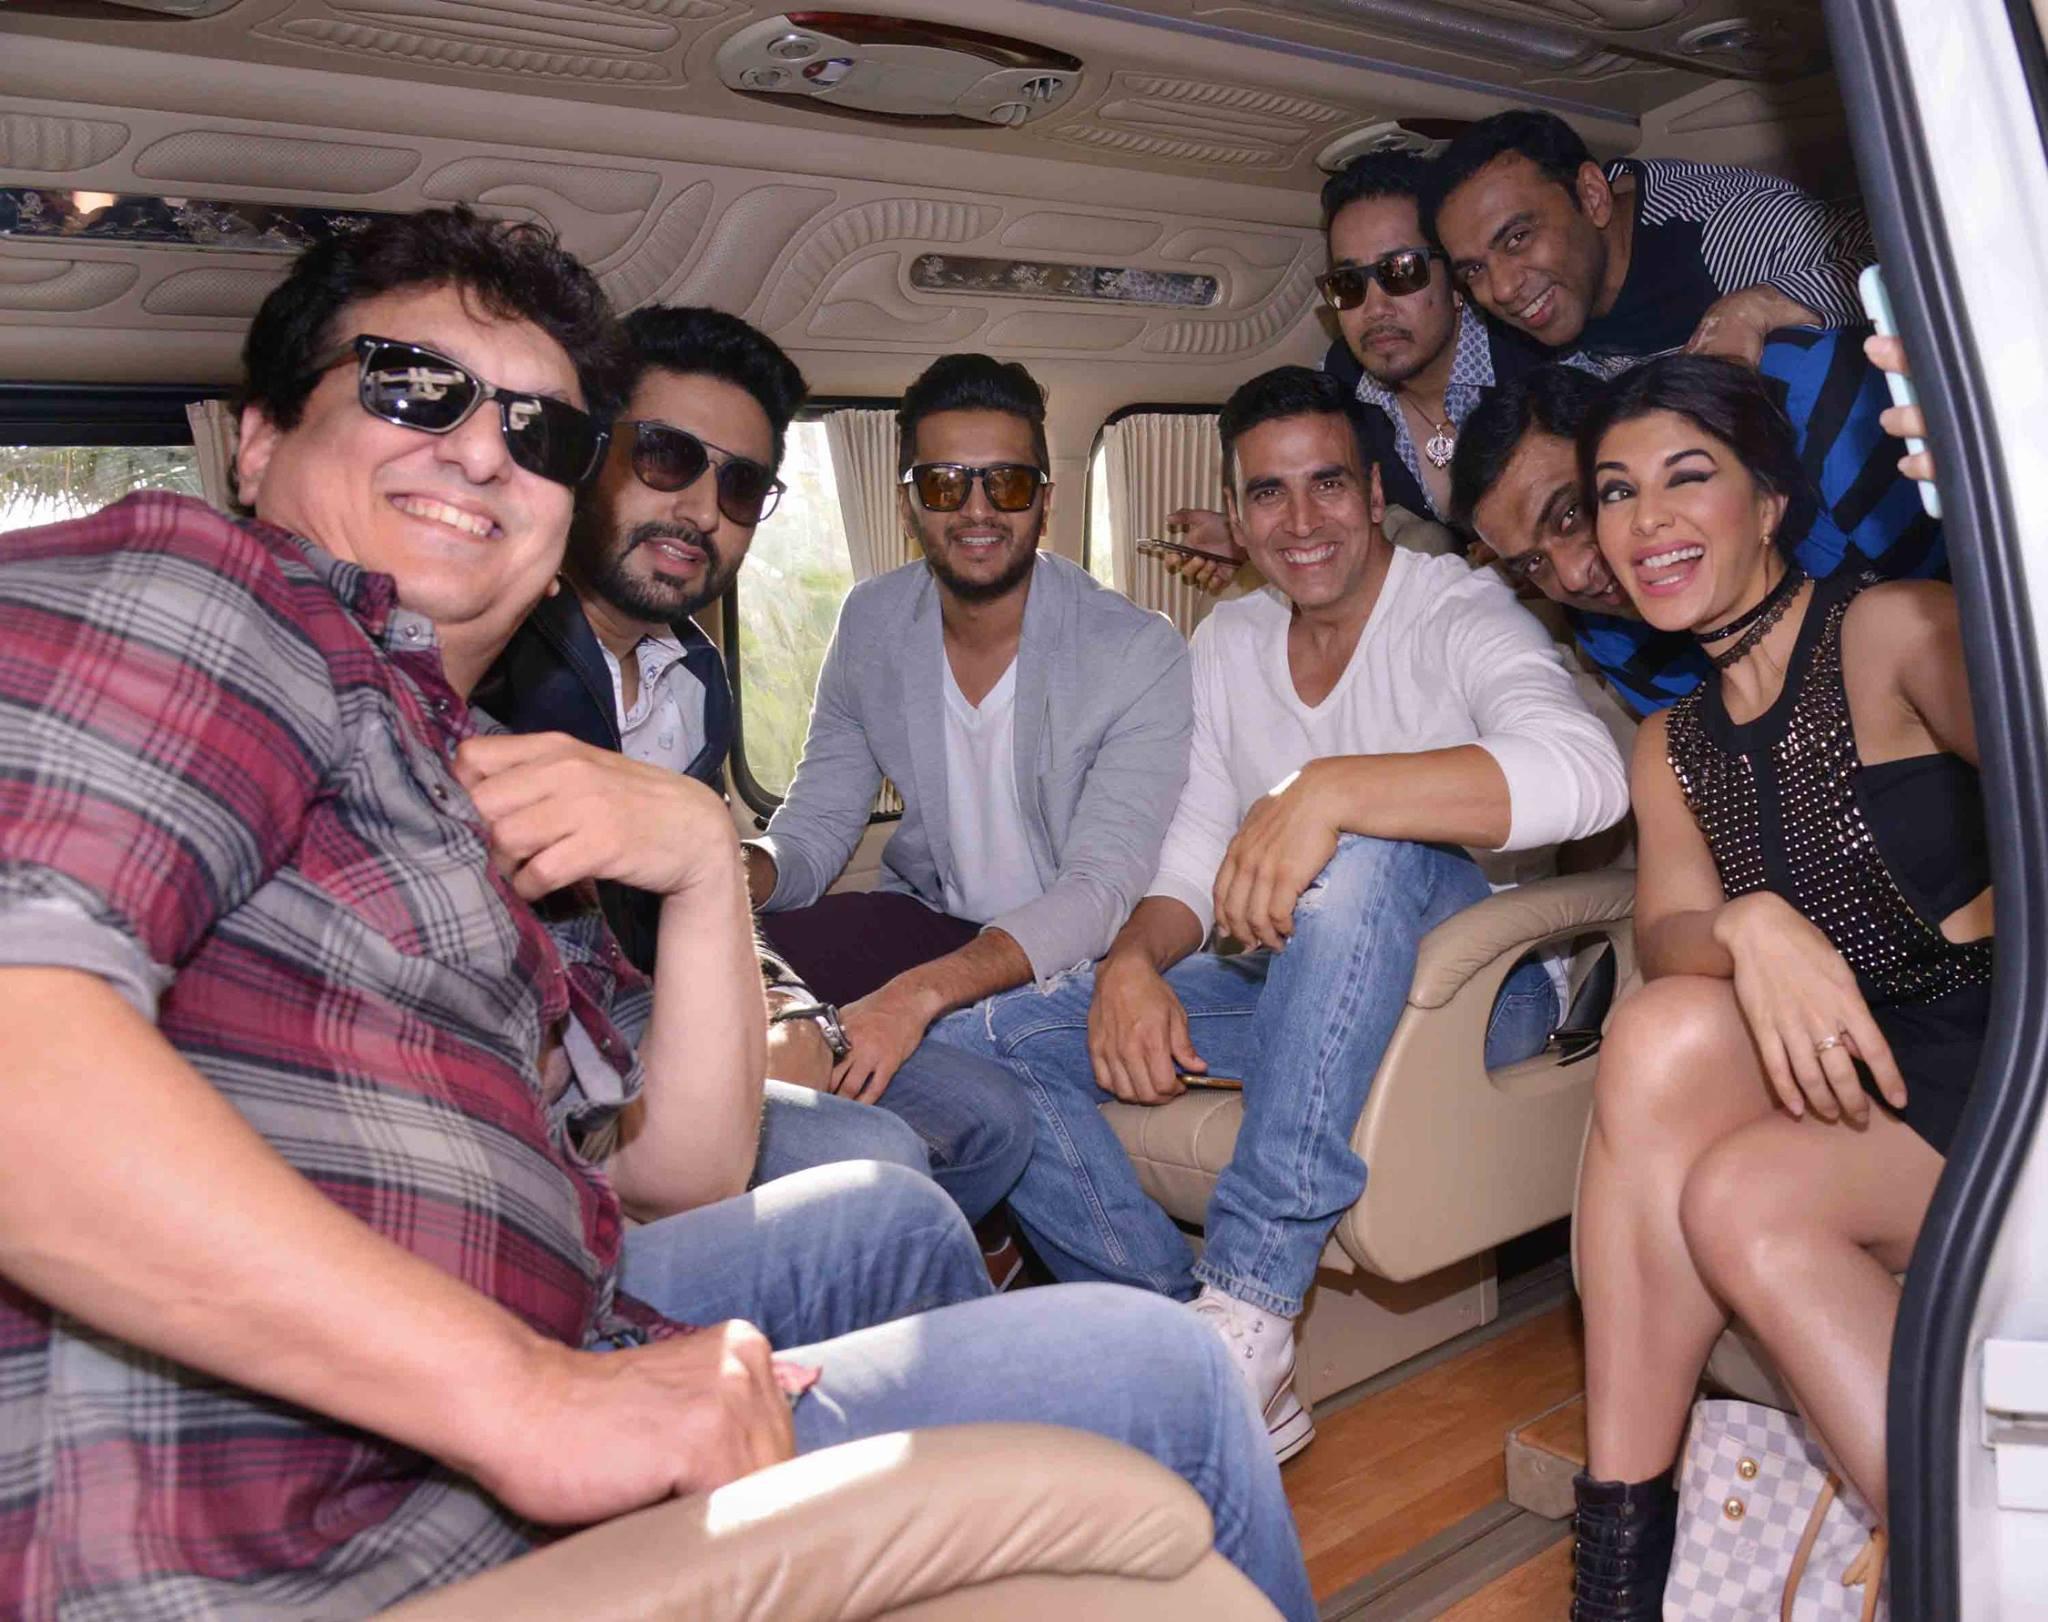 Akshay Kumar and Abhishek Bachchan stars of Housefull 3 produced by Sajid Nadiadwala